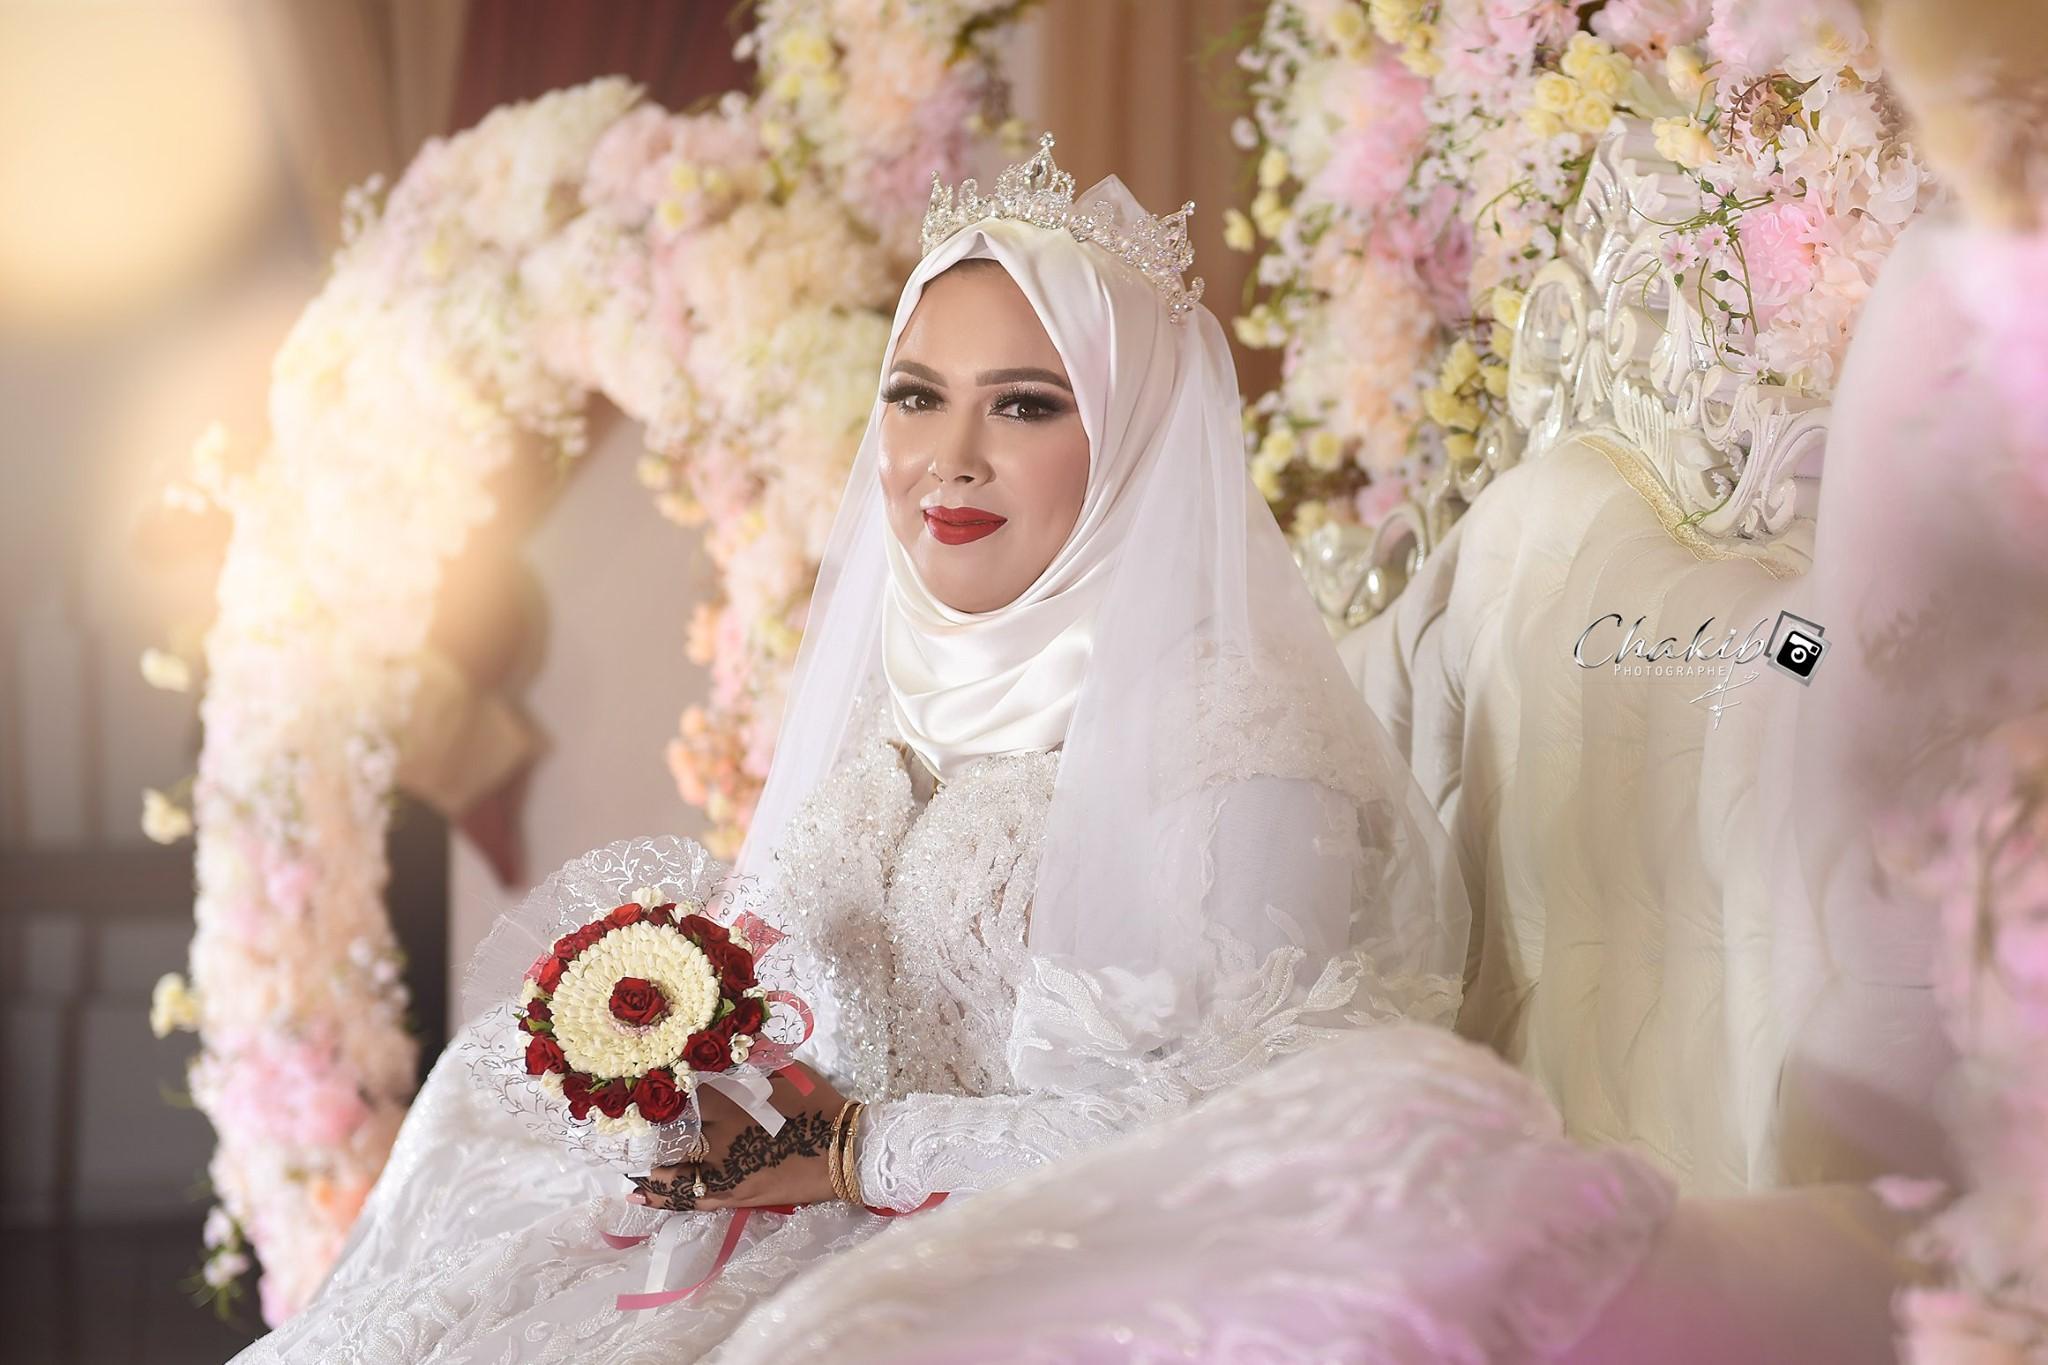 sirine tra10_plus_belles_mariées_tunisiennes_184_2019